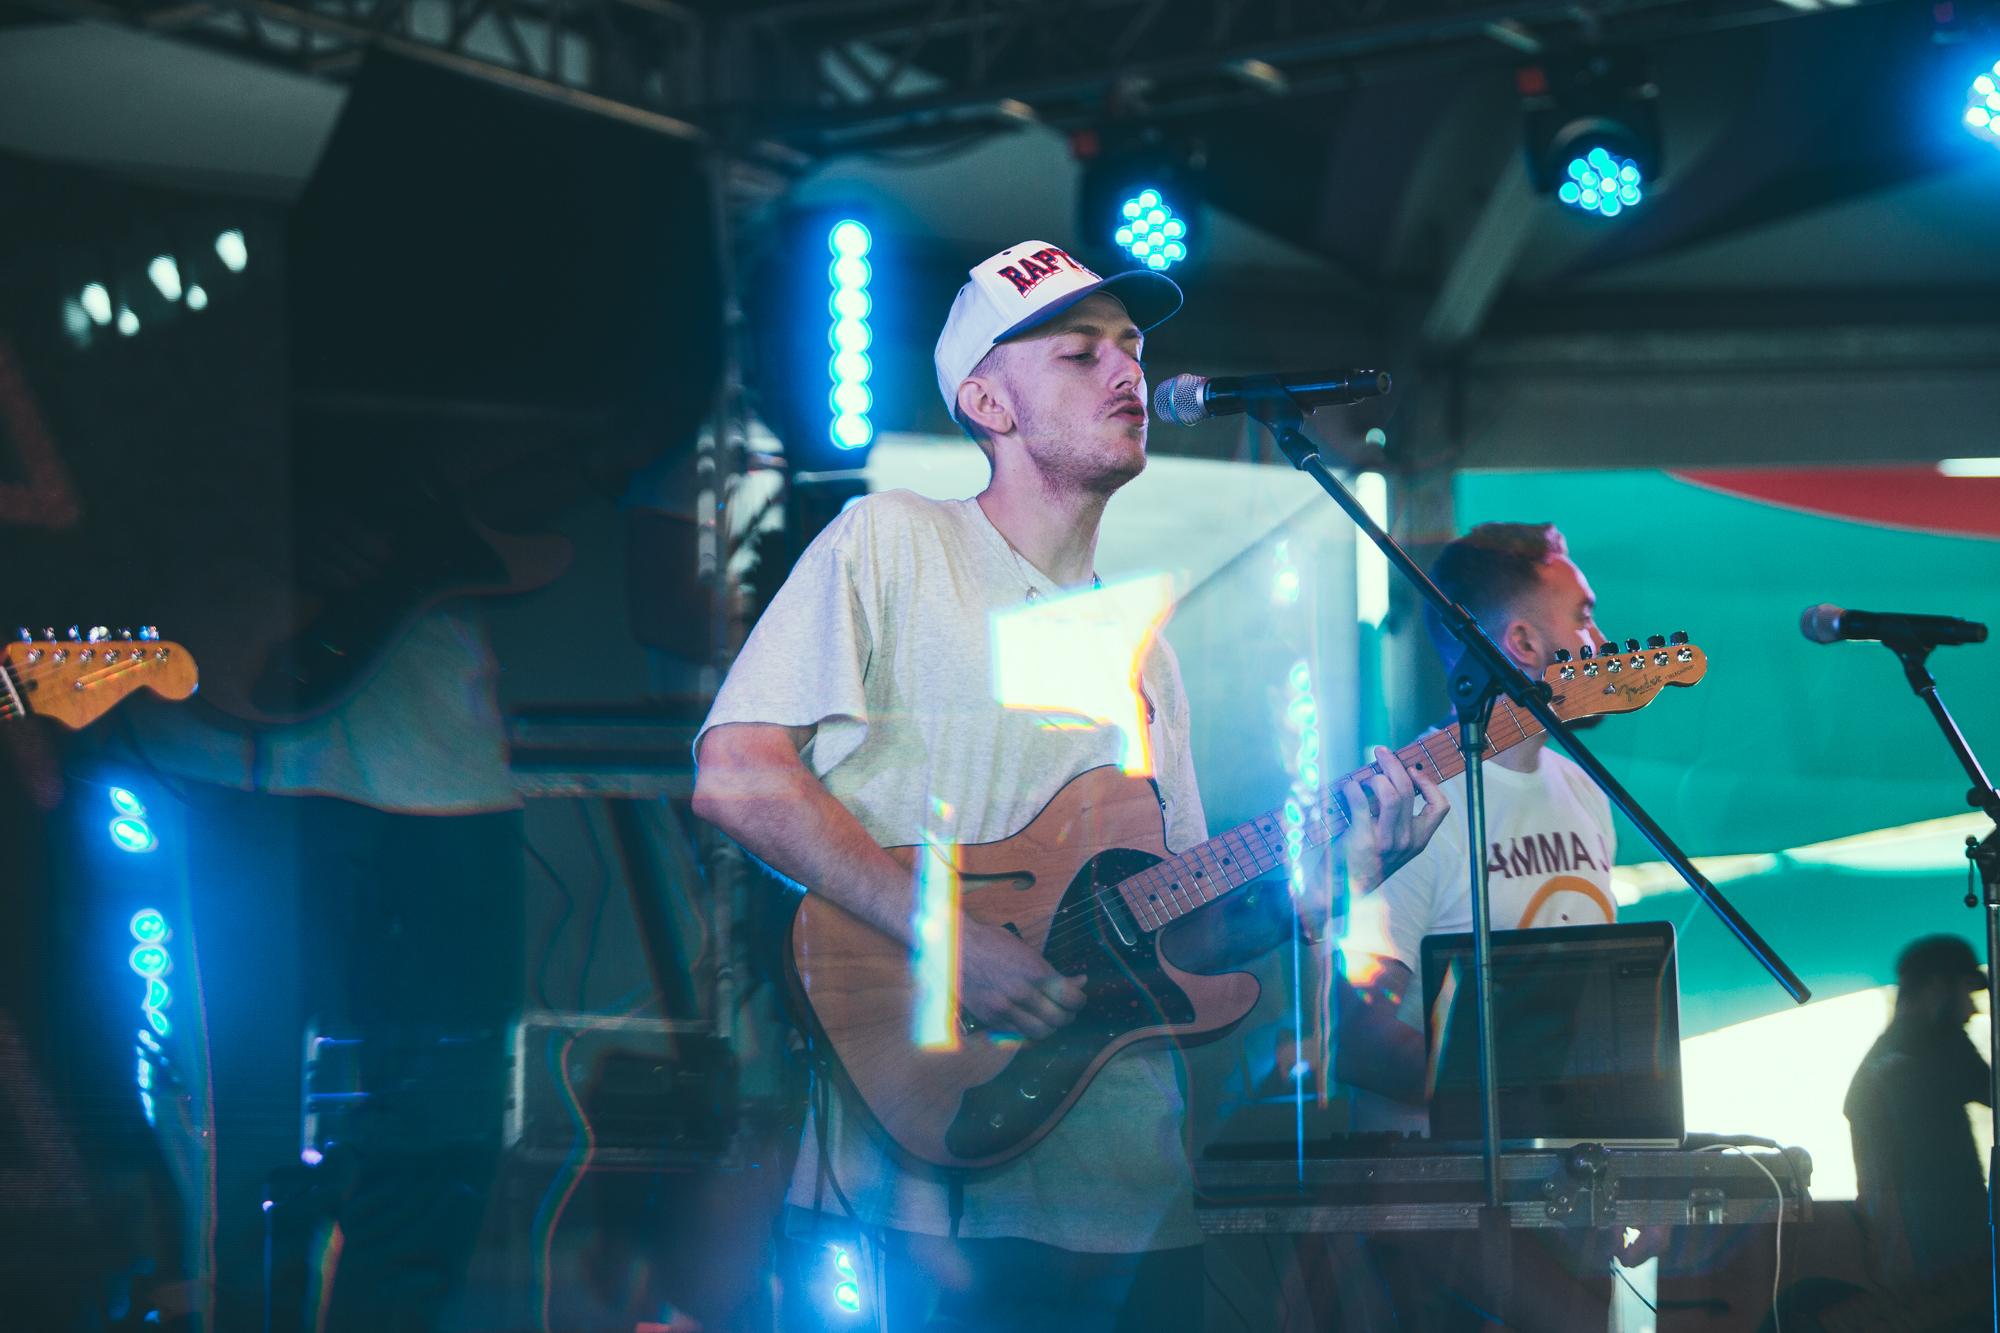 River Tiber-Festival Ceremonia-Mexico-Foro Pegaso-04.02.2017-Daniel Patlan_Desde 1989 (2 of 6).jpg